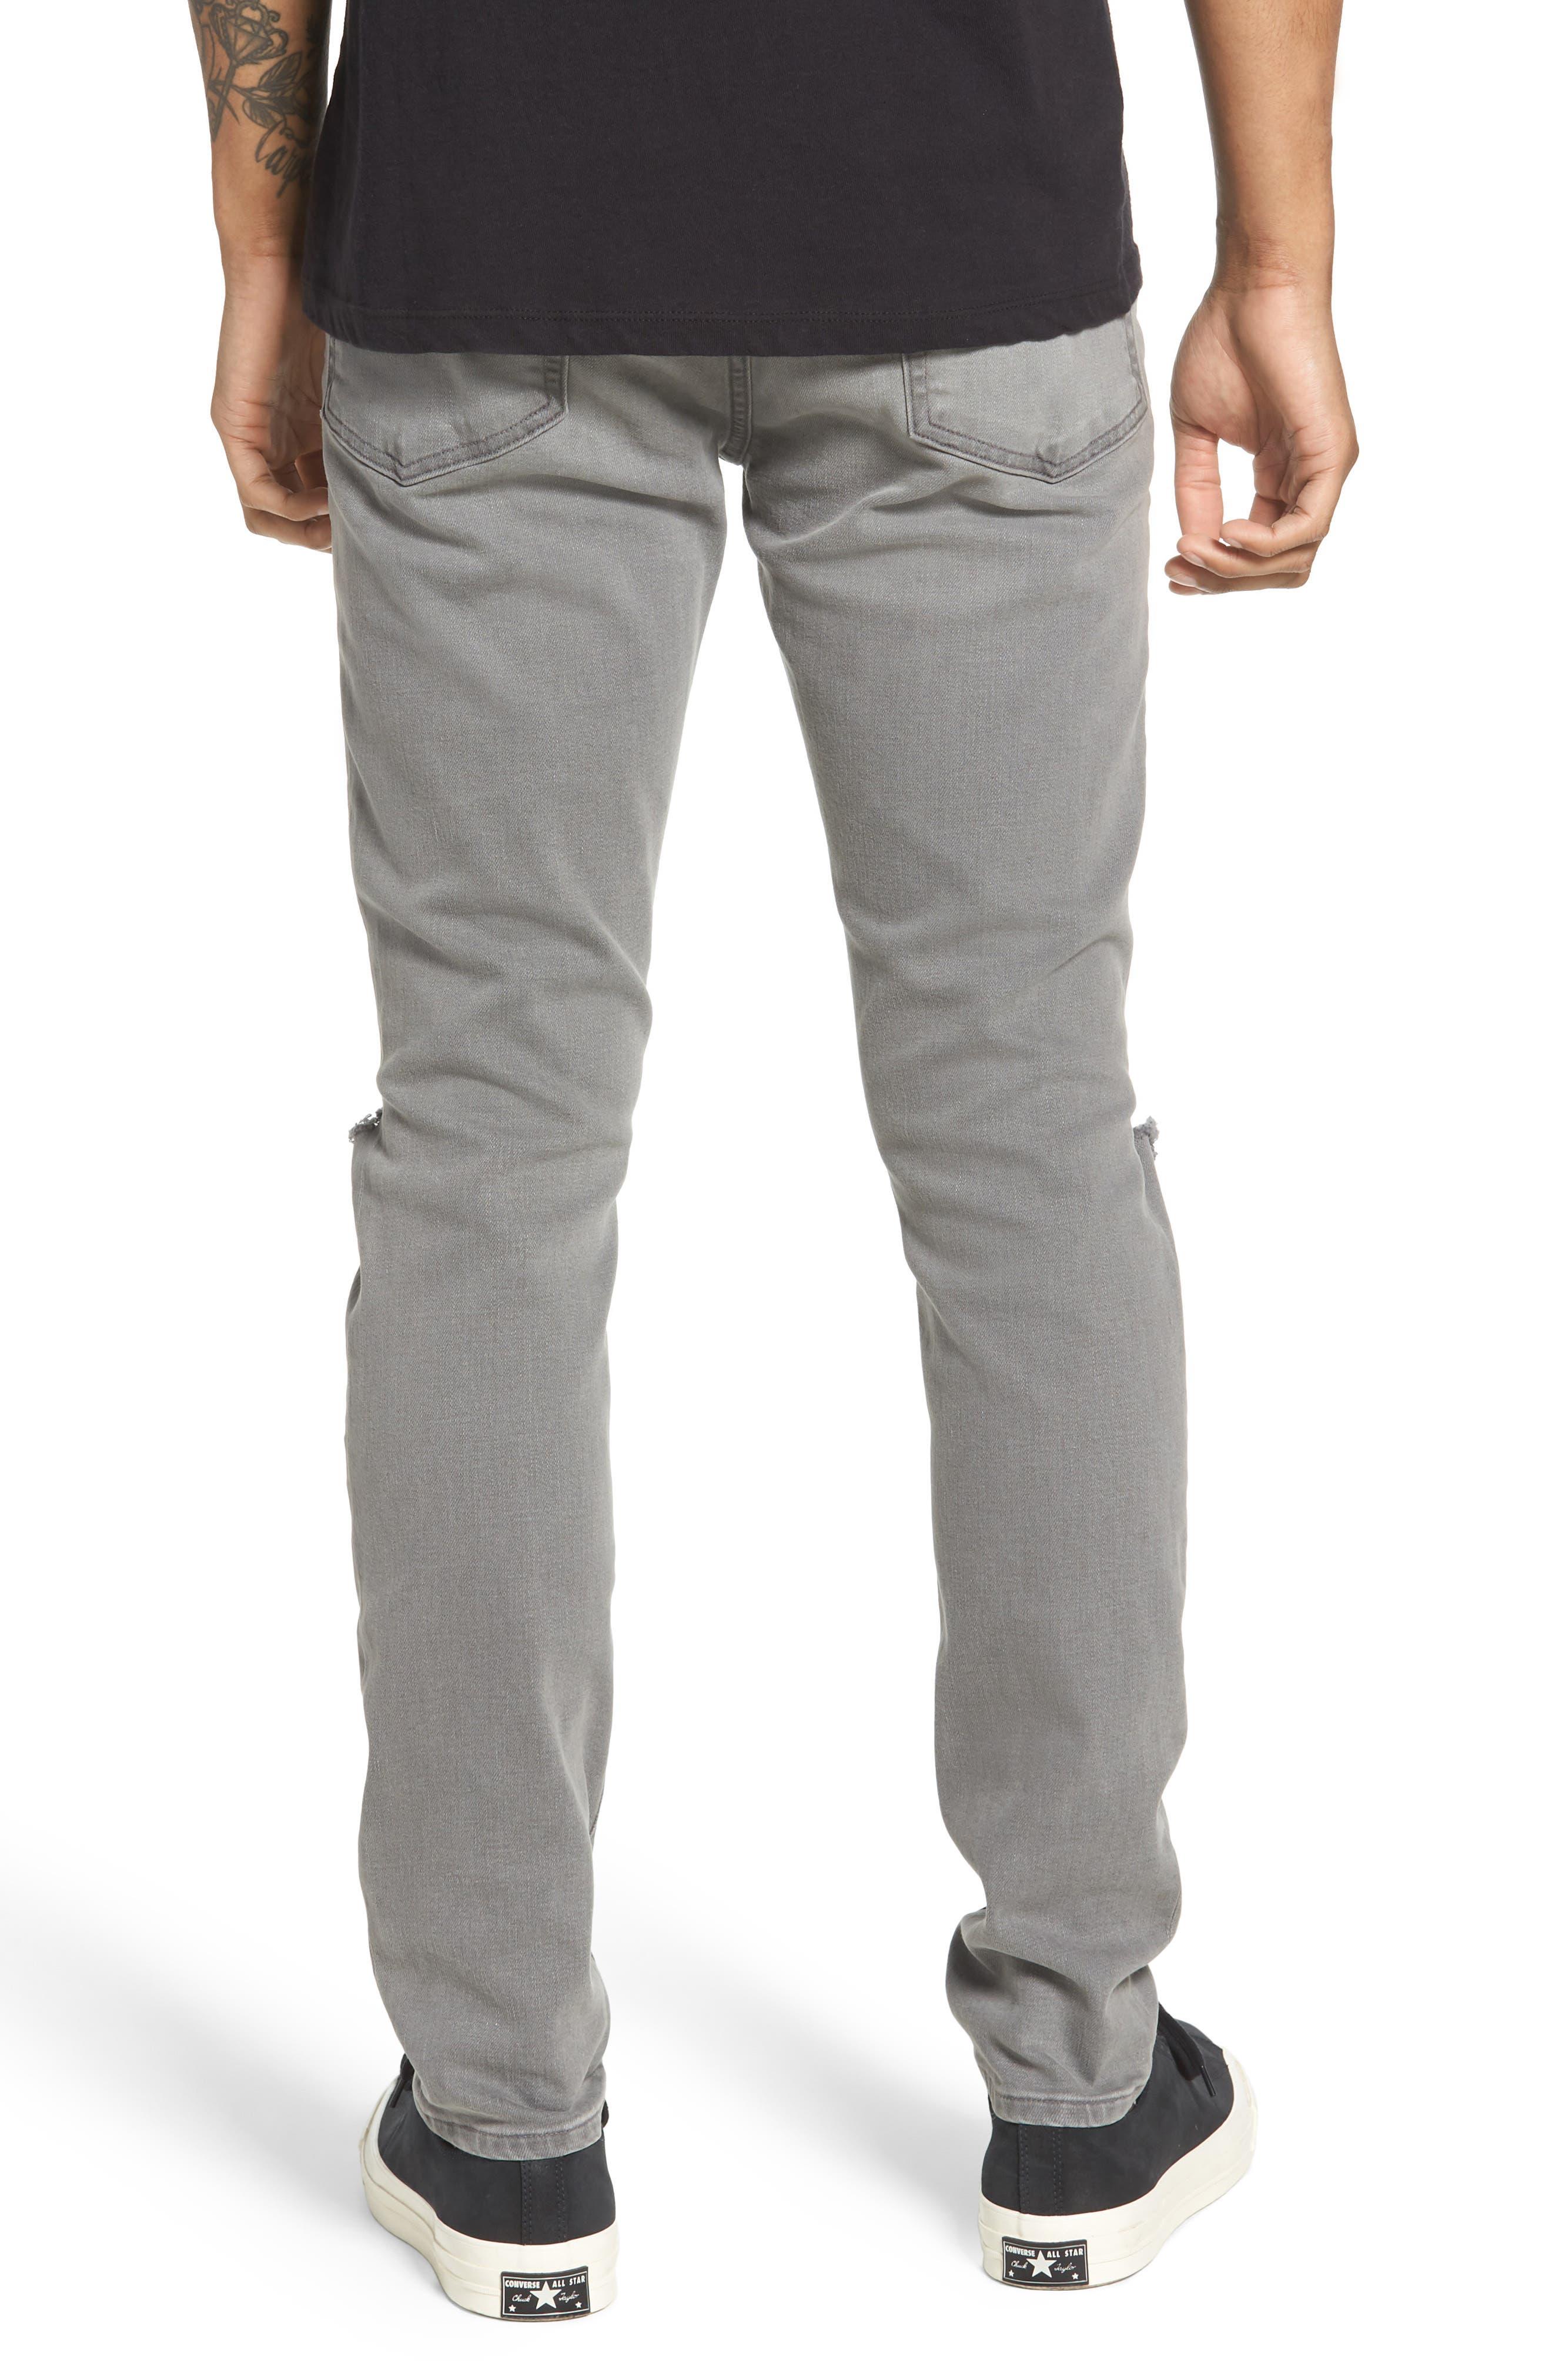 L'Homme Skinny Fit Jeans,                             Alternate thumbnail 2, color,                             030